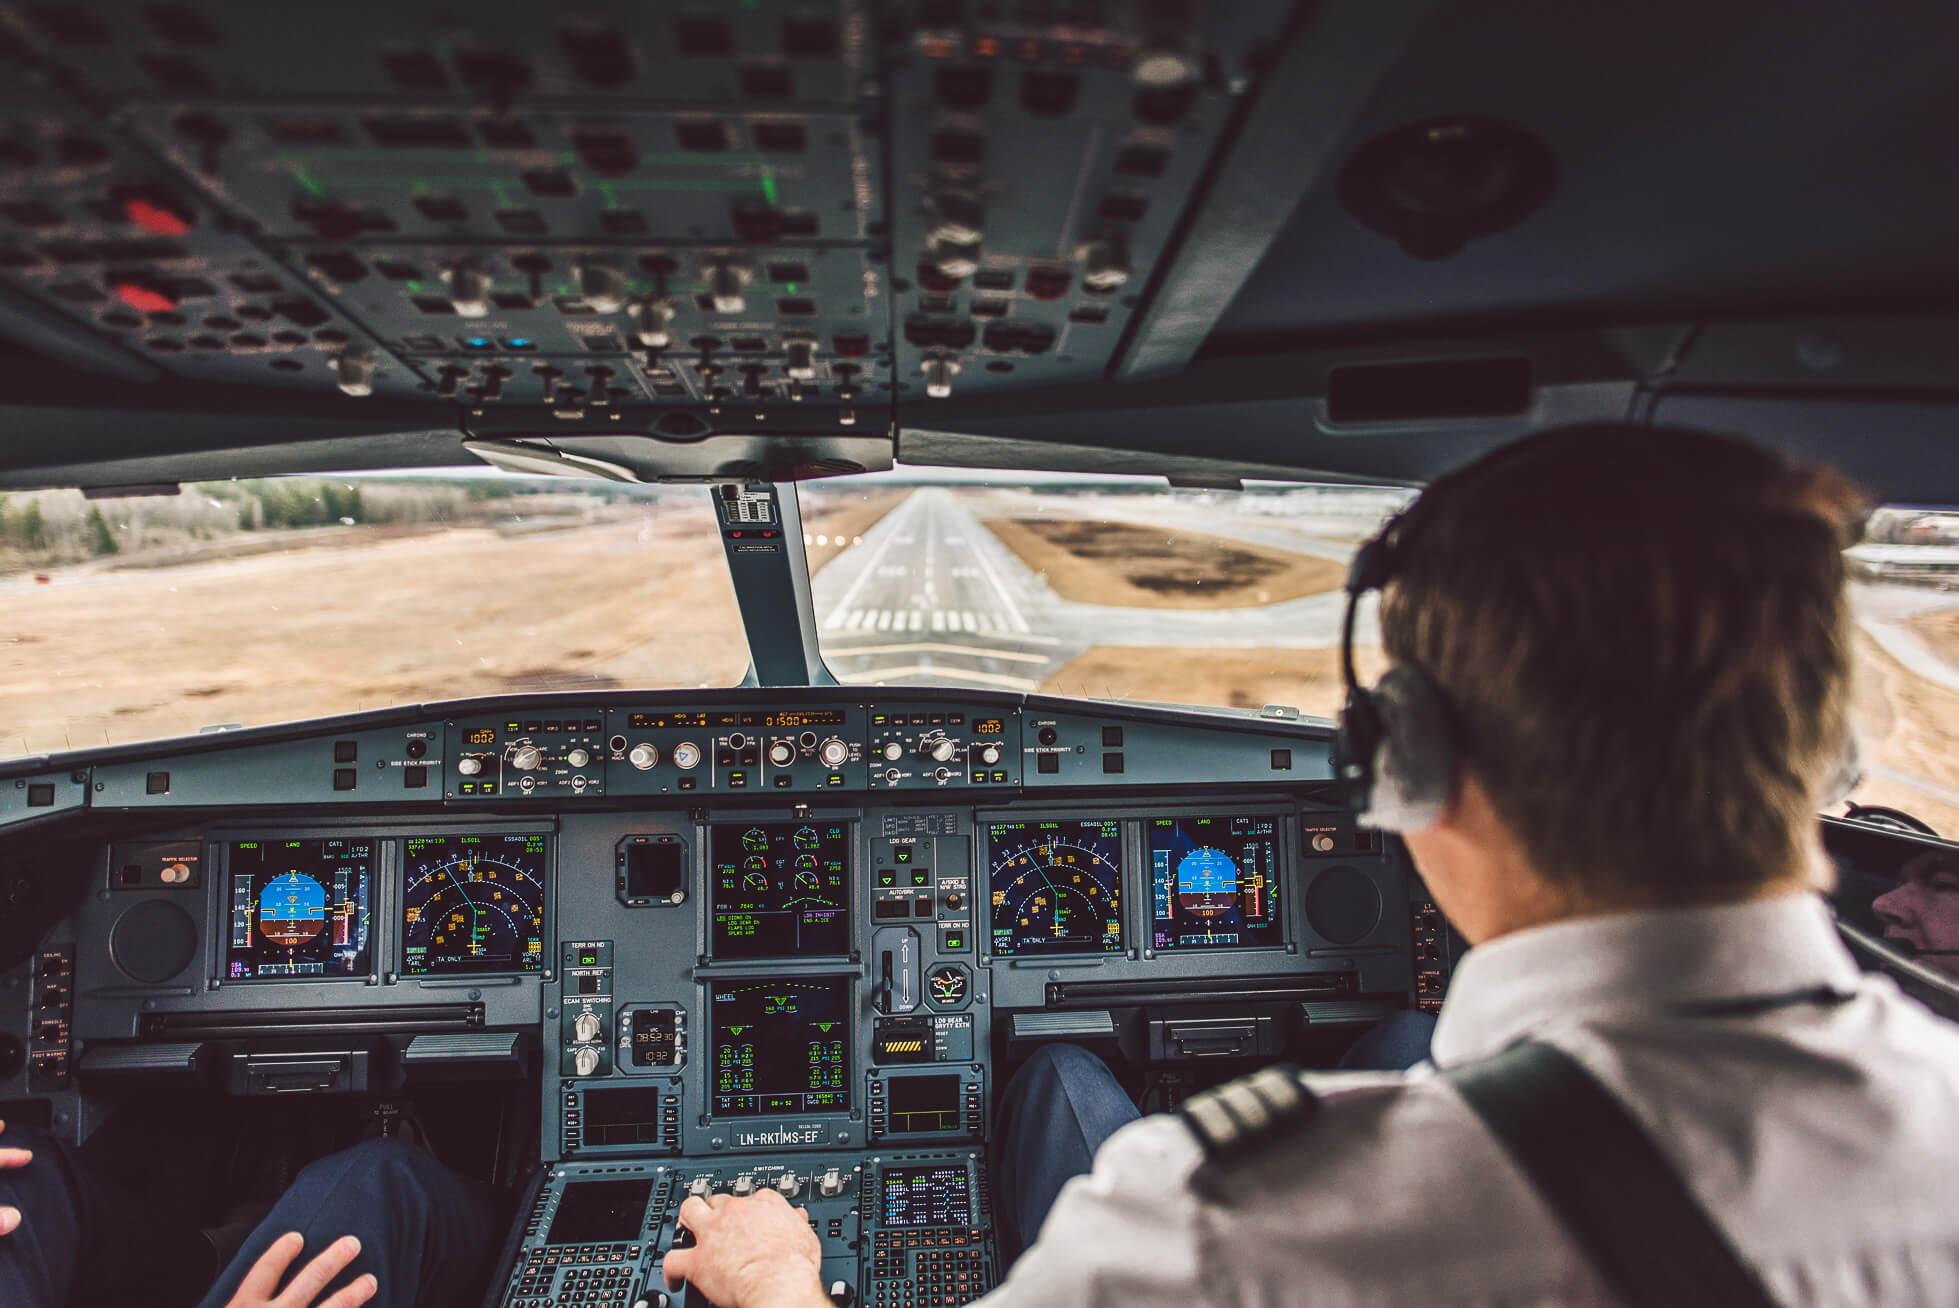 janni-deler-flight-mode-sasDSC_1576